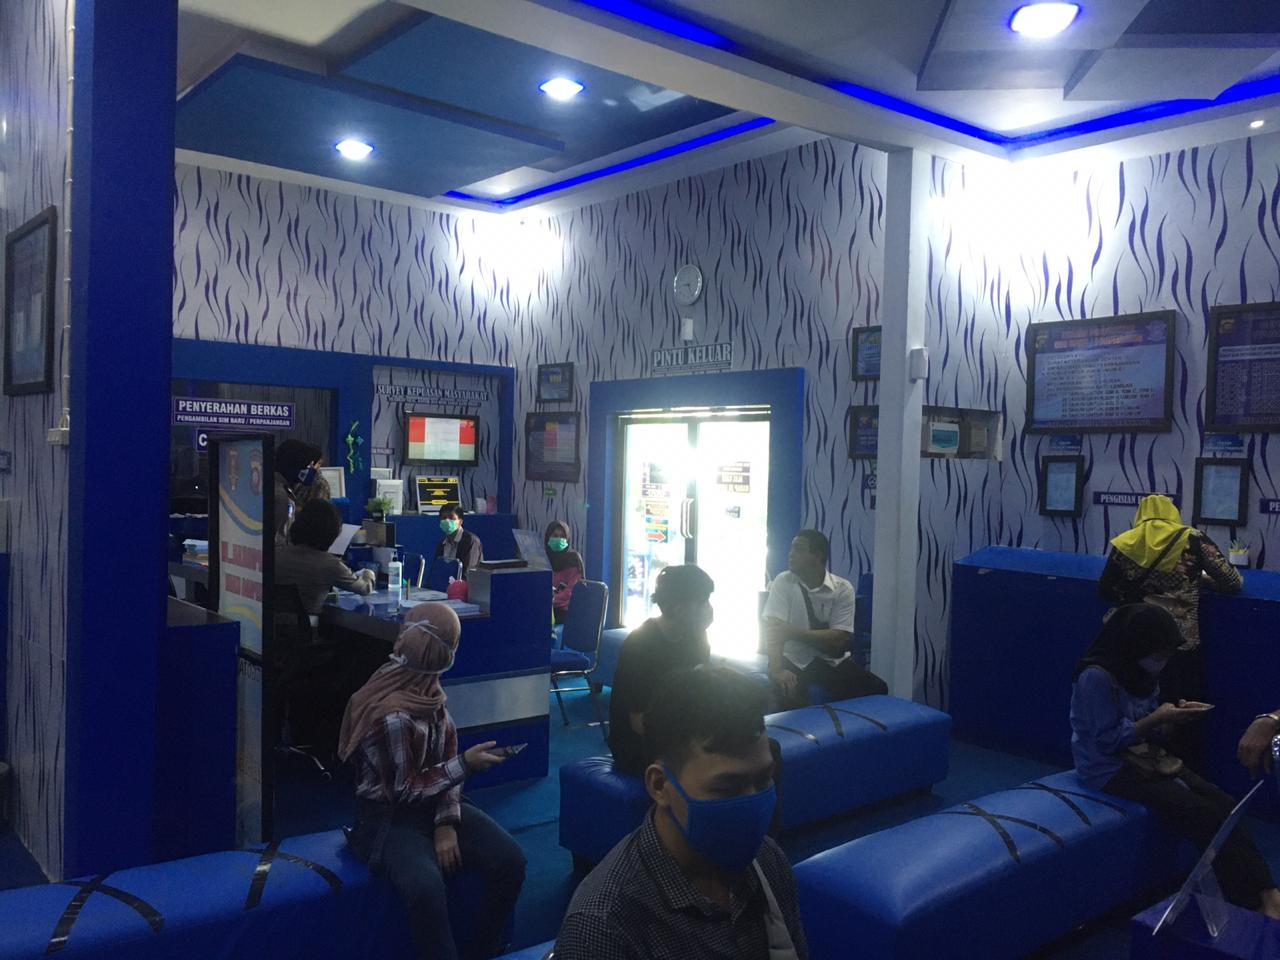 Cegah Covid-19, Polres Ketapang Berlakukan Prosedur Ketat Pelayanan SIM